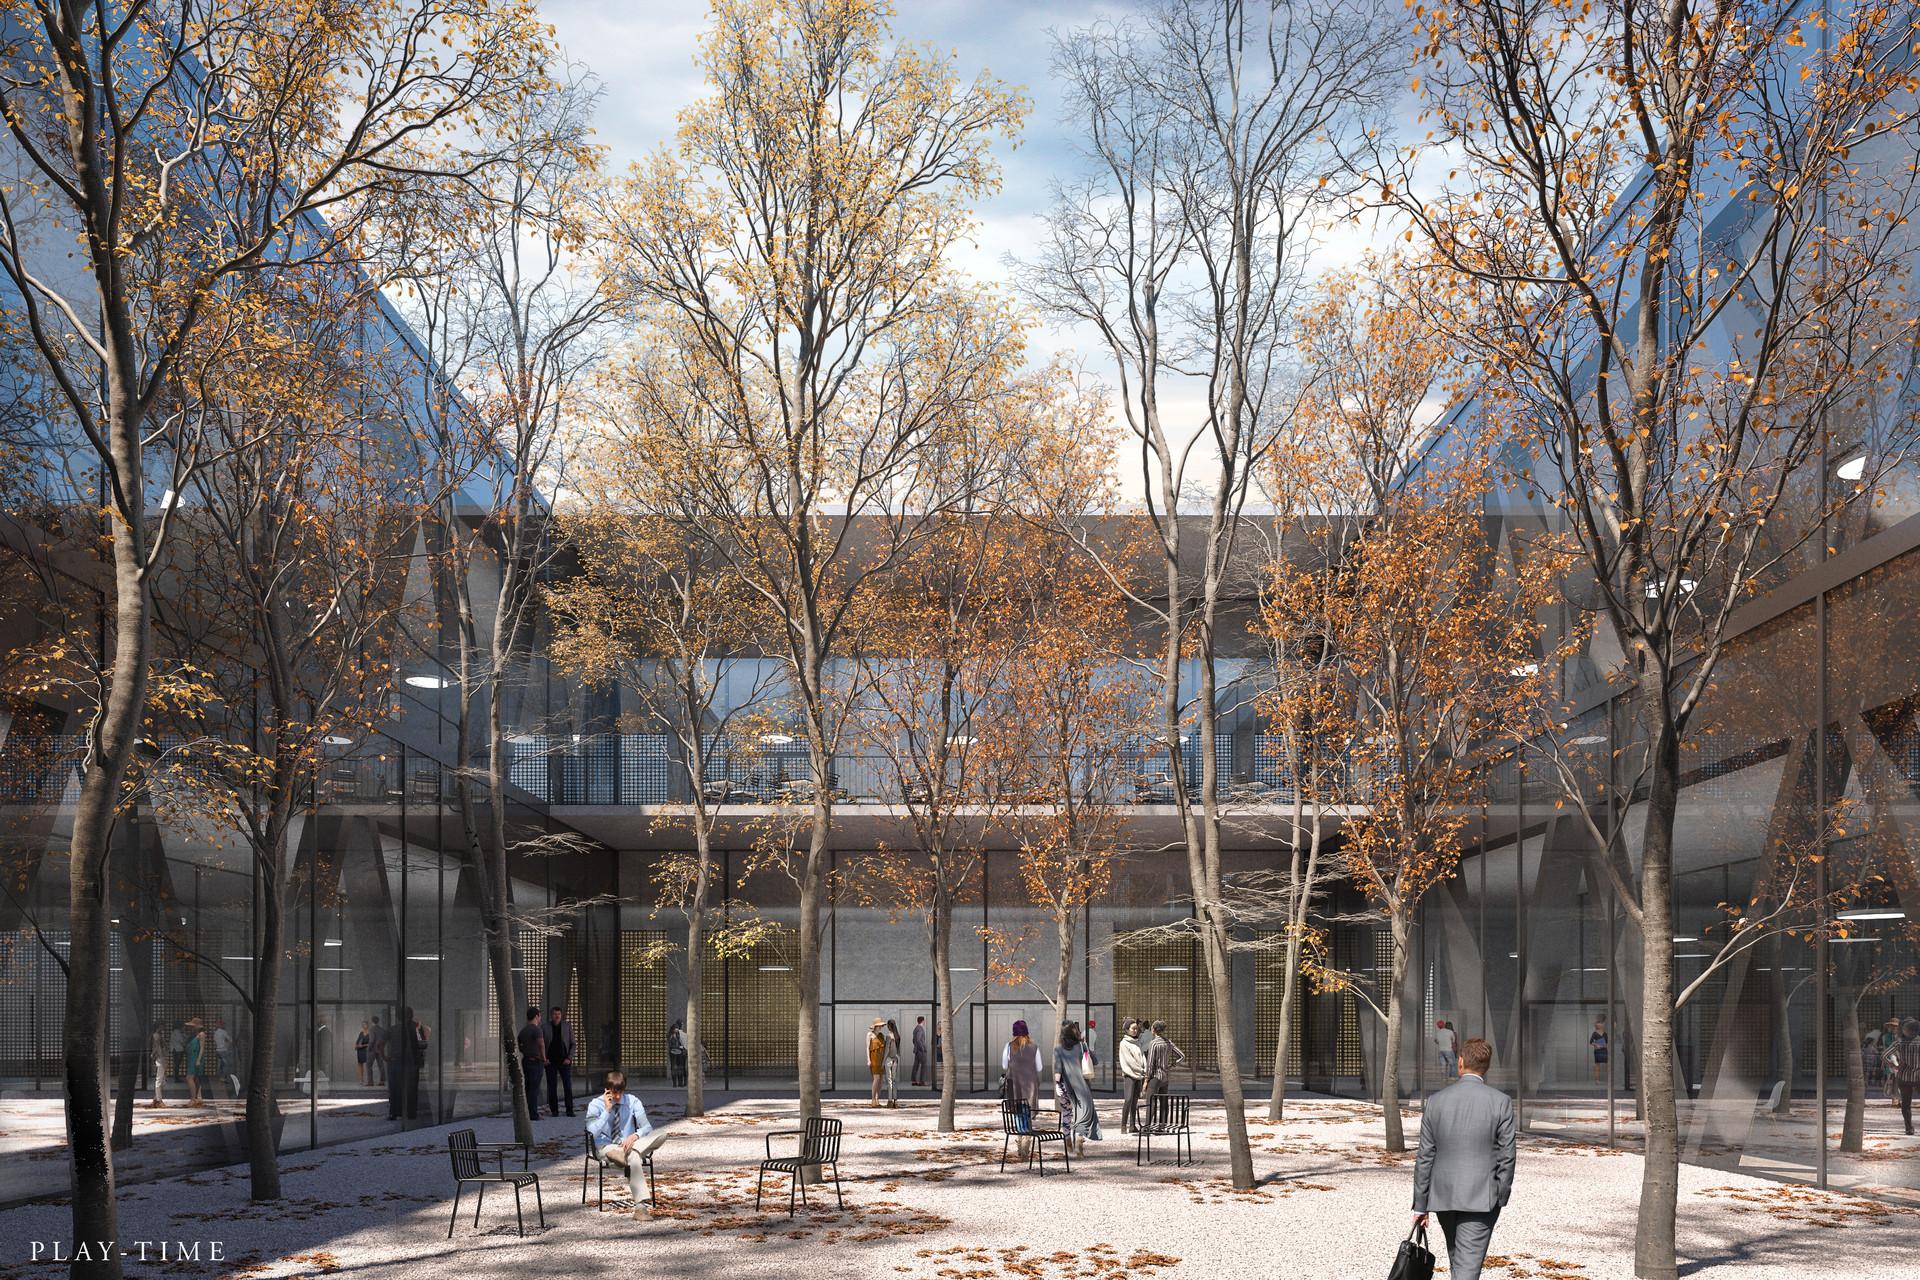 Play time architectonic image iaag architekten bernexpo hall bern 02